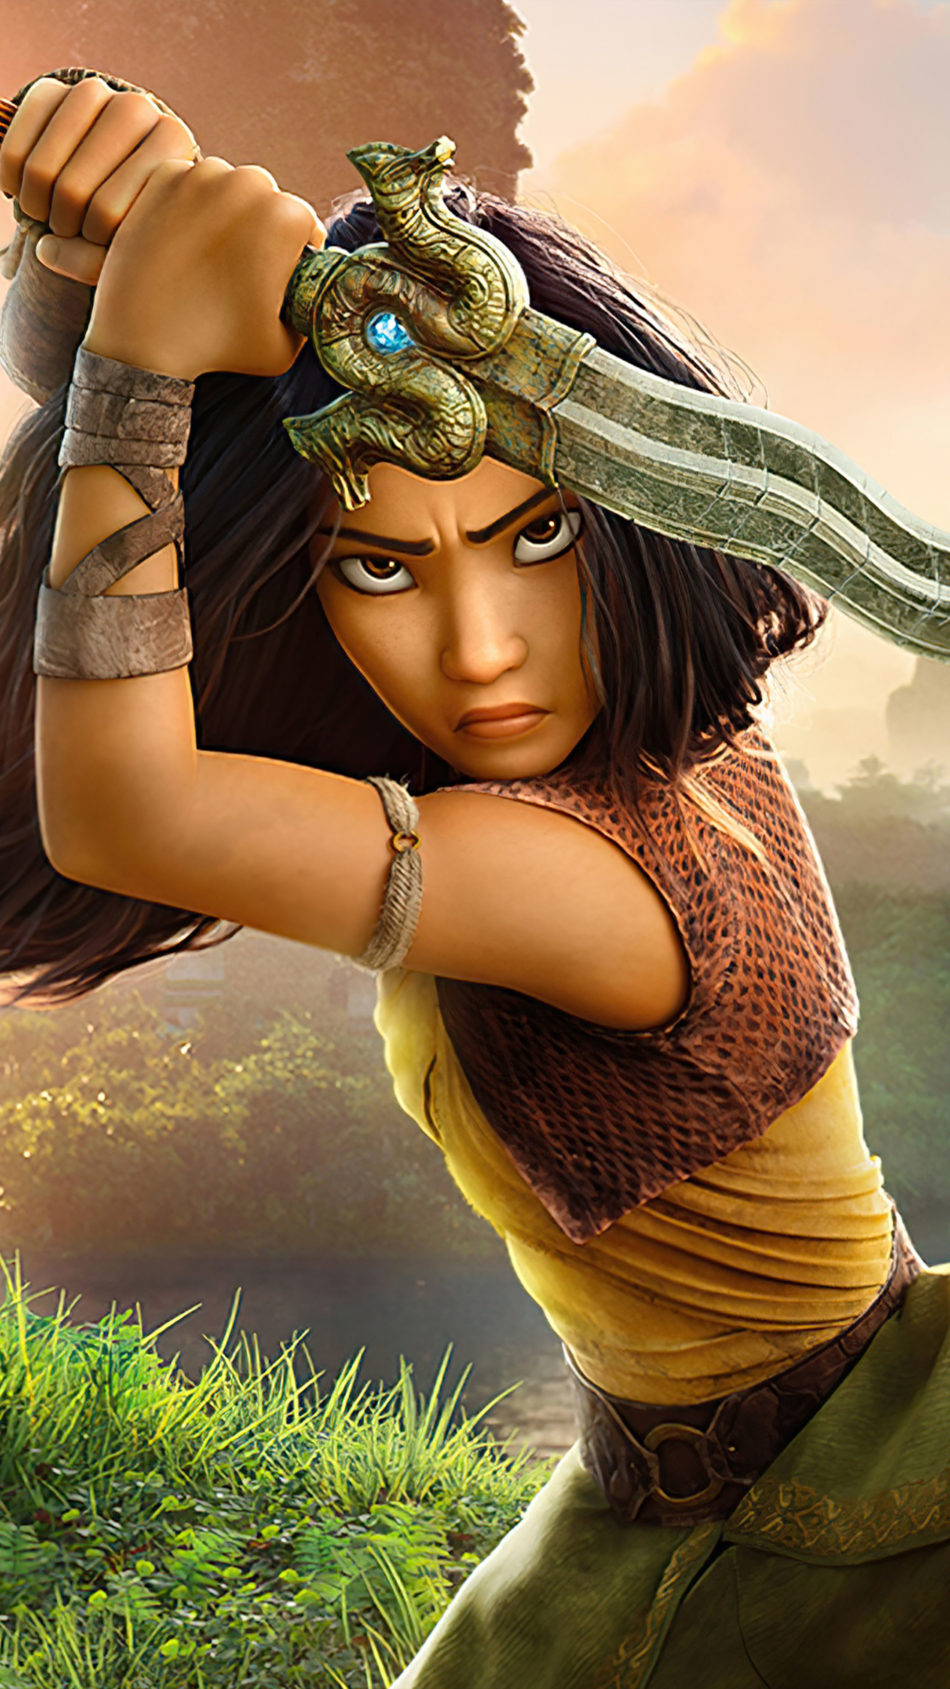 Raya With Sword In Raya and The Last Dragon 4K Ultra HD Mobile Wallpaper